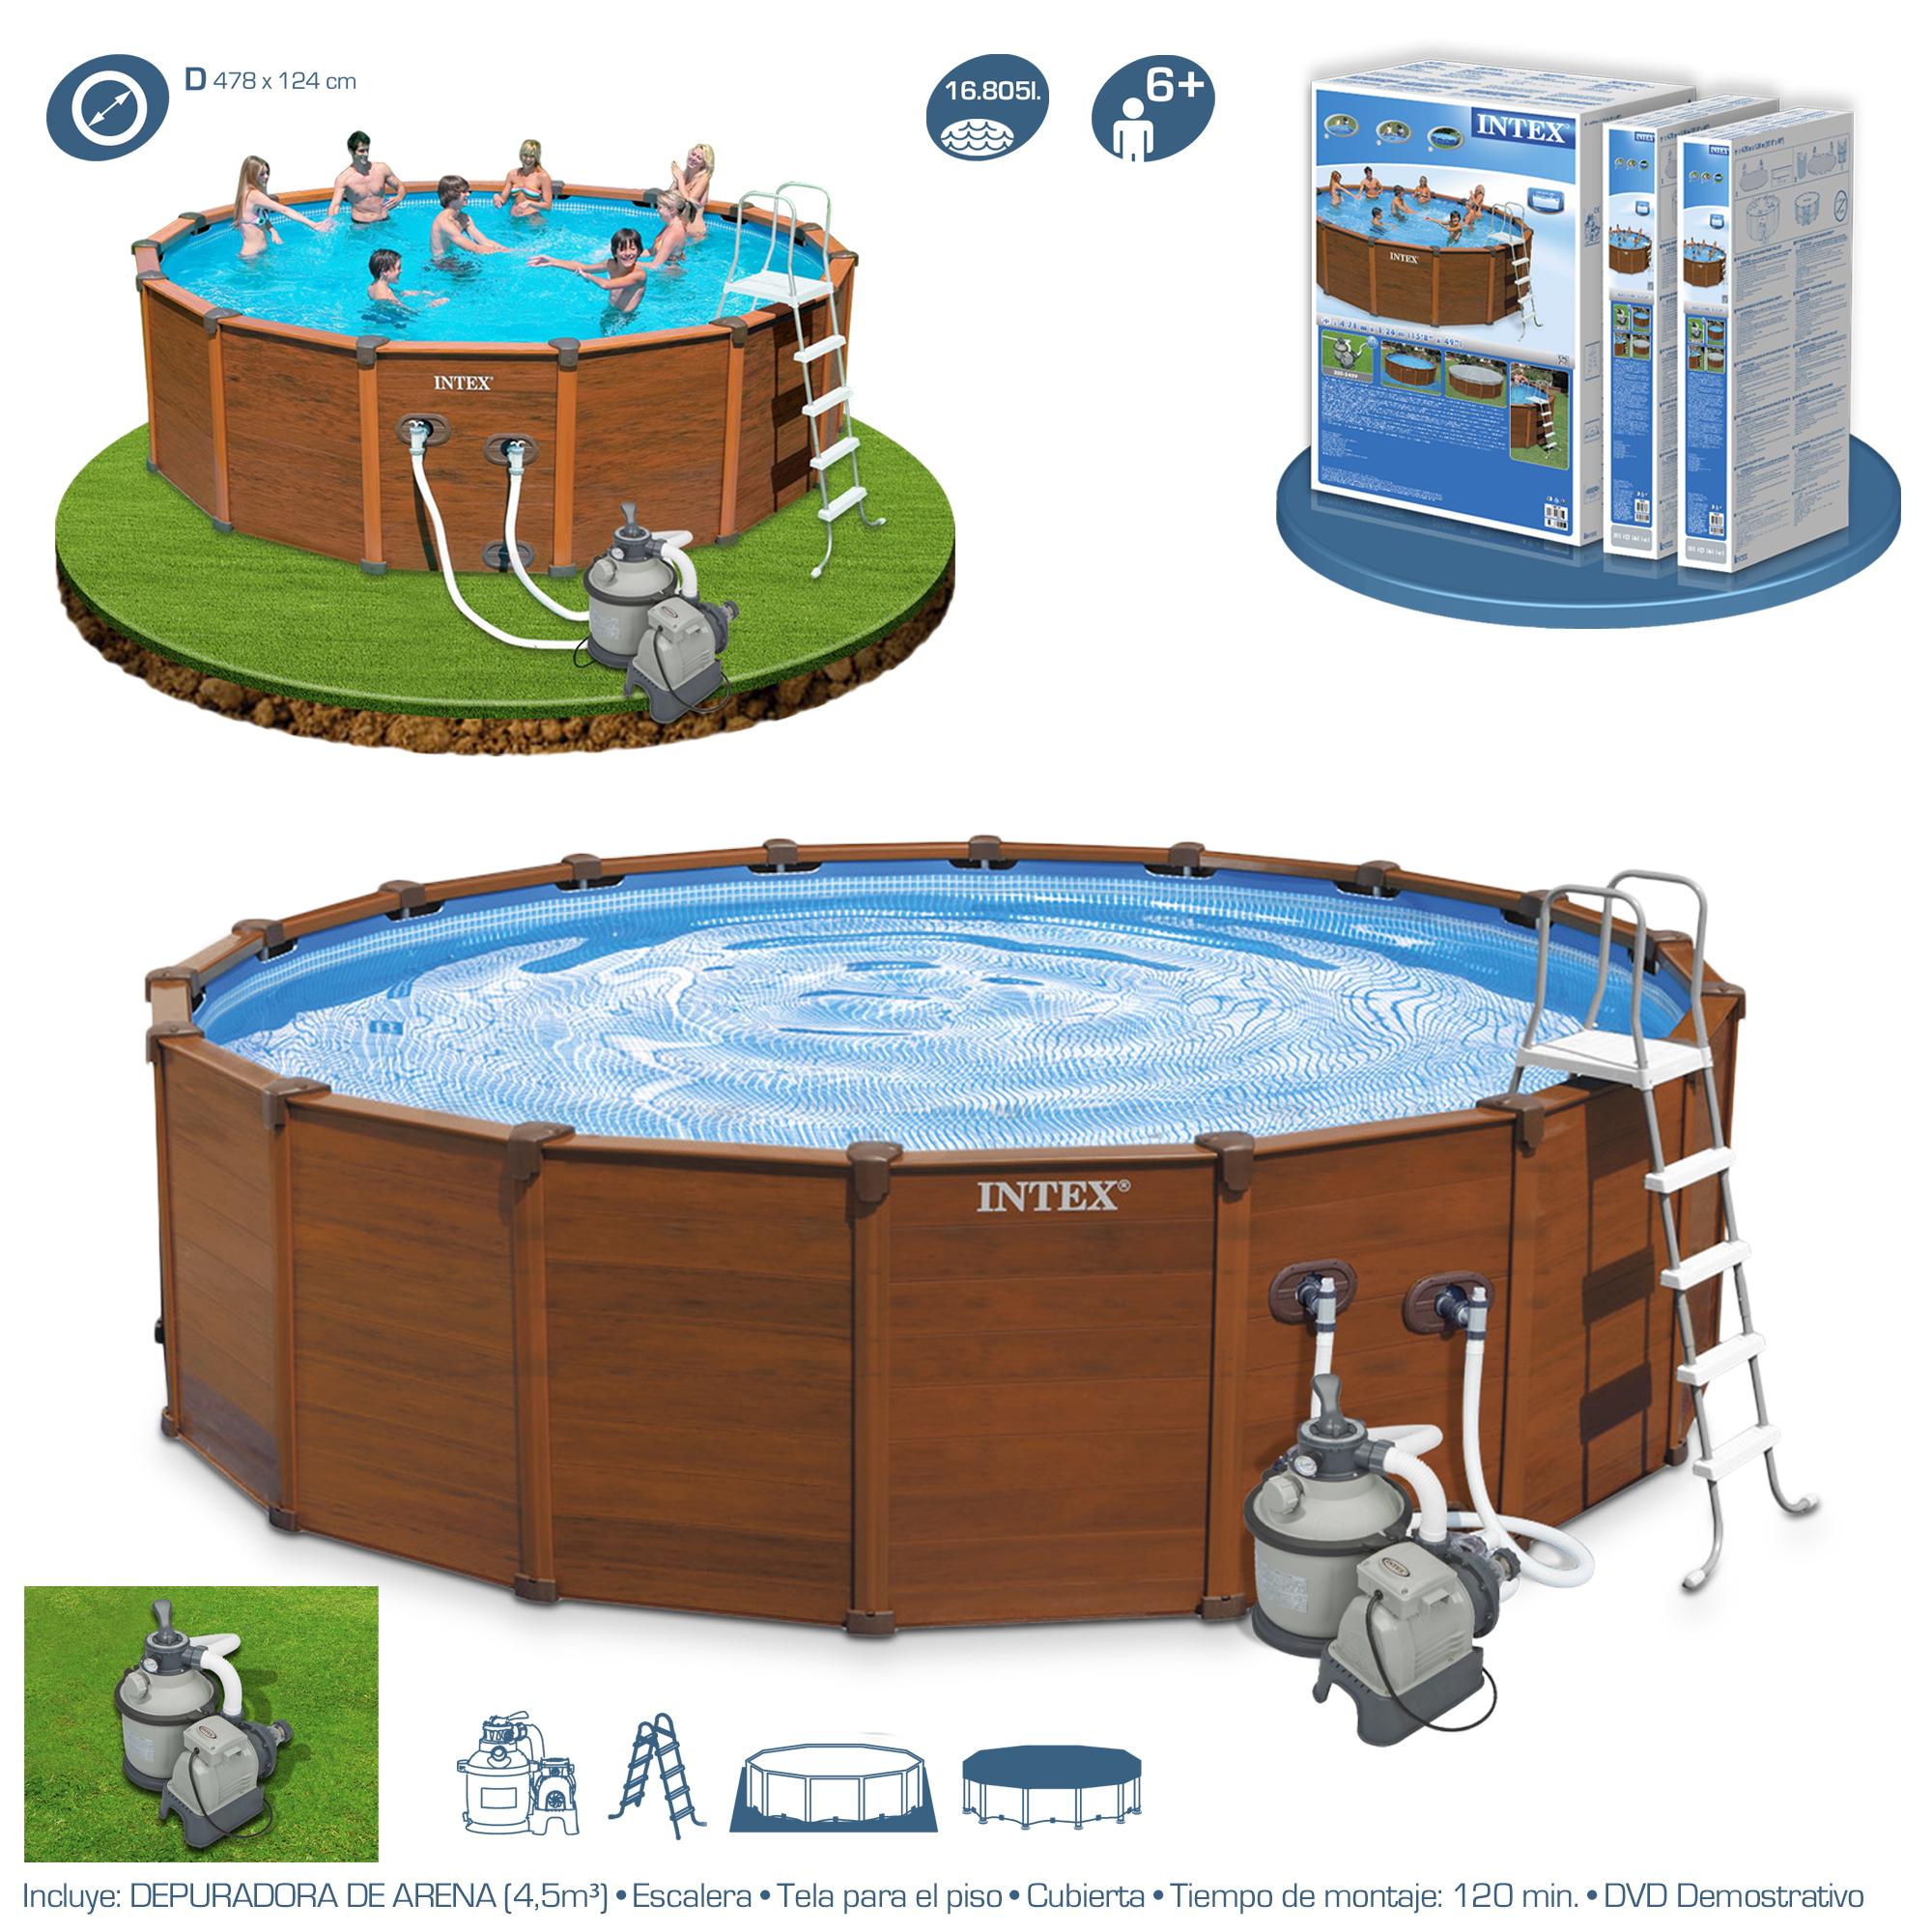 Piscina intex sequoia spirit 478x124 imitaci n madera 28382 piscinas desmontables - Escalera piscina segunda mano ...